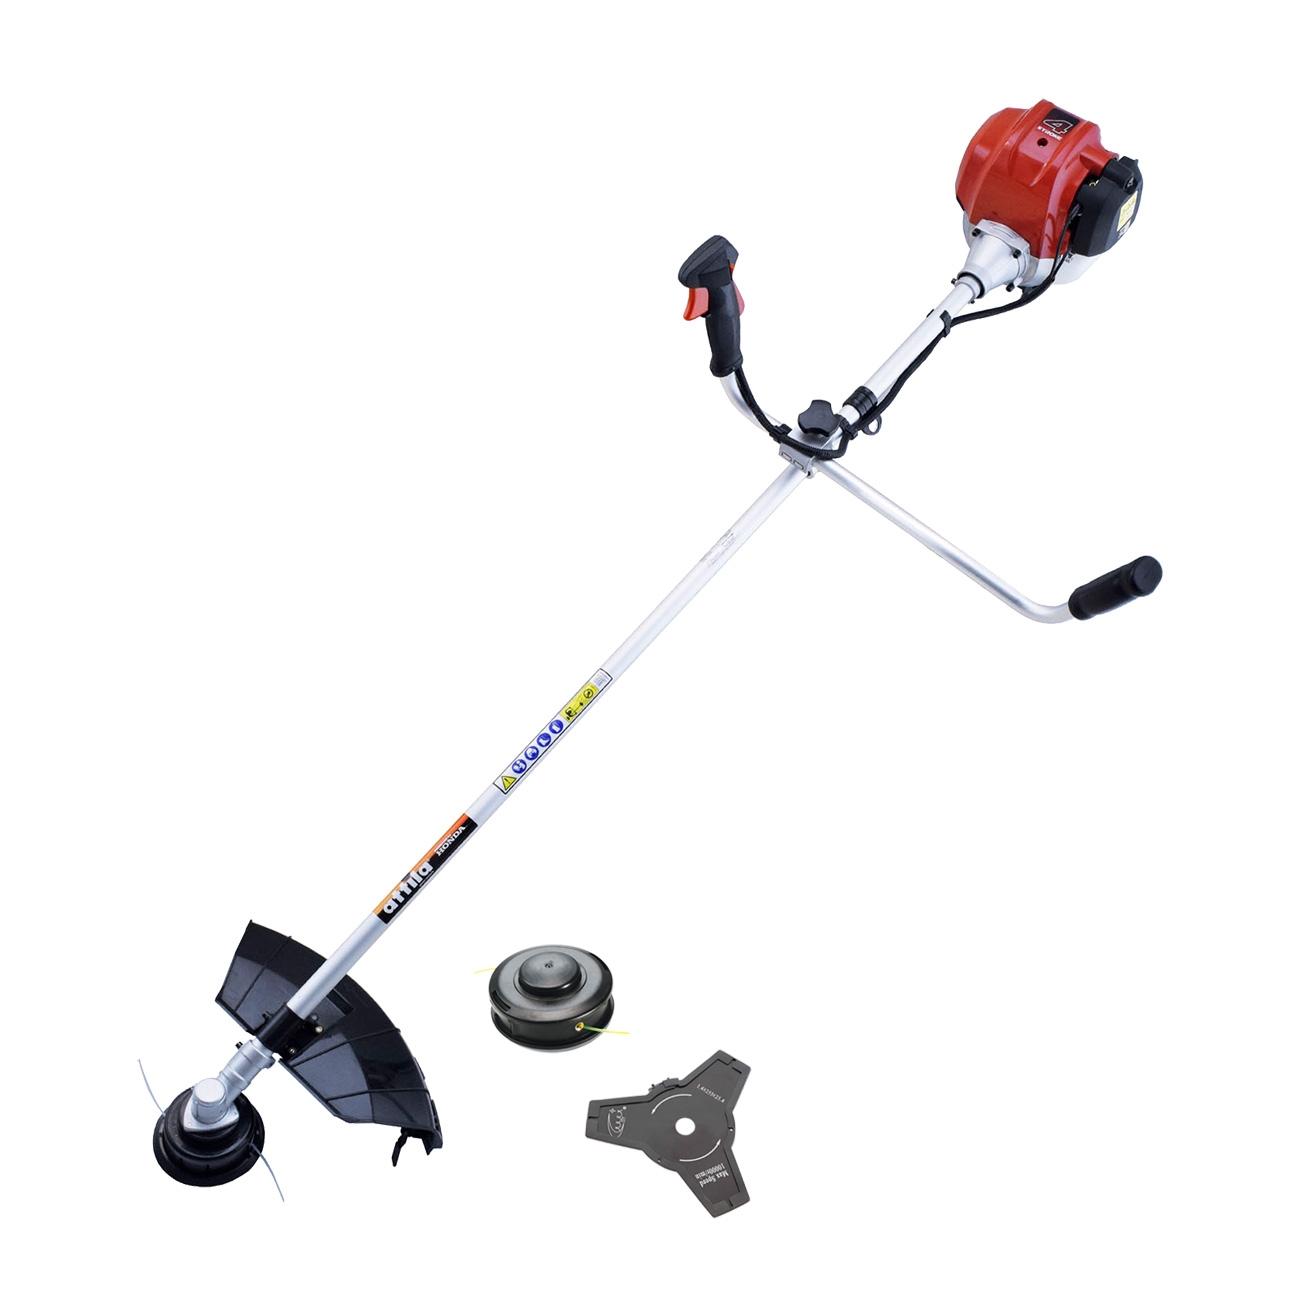 Honda GX 50 Petrol Brush cutter - double handle - Refurbished 1